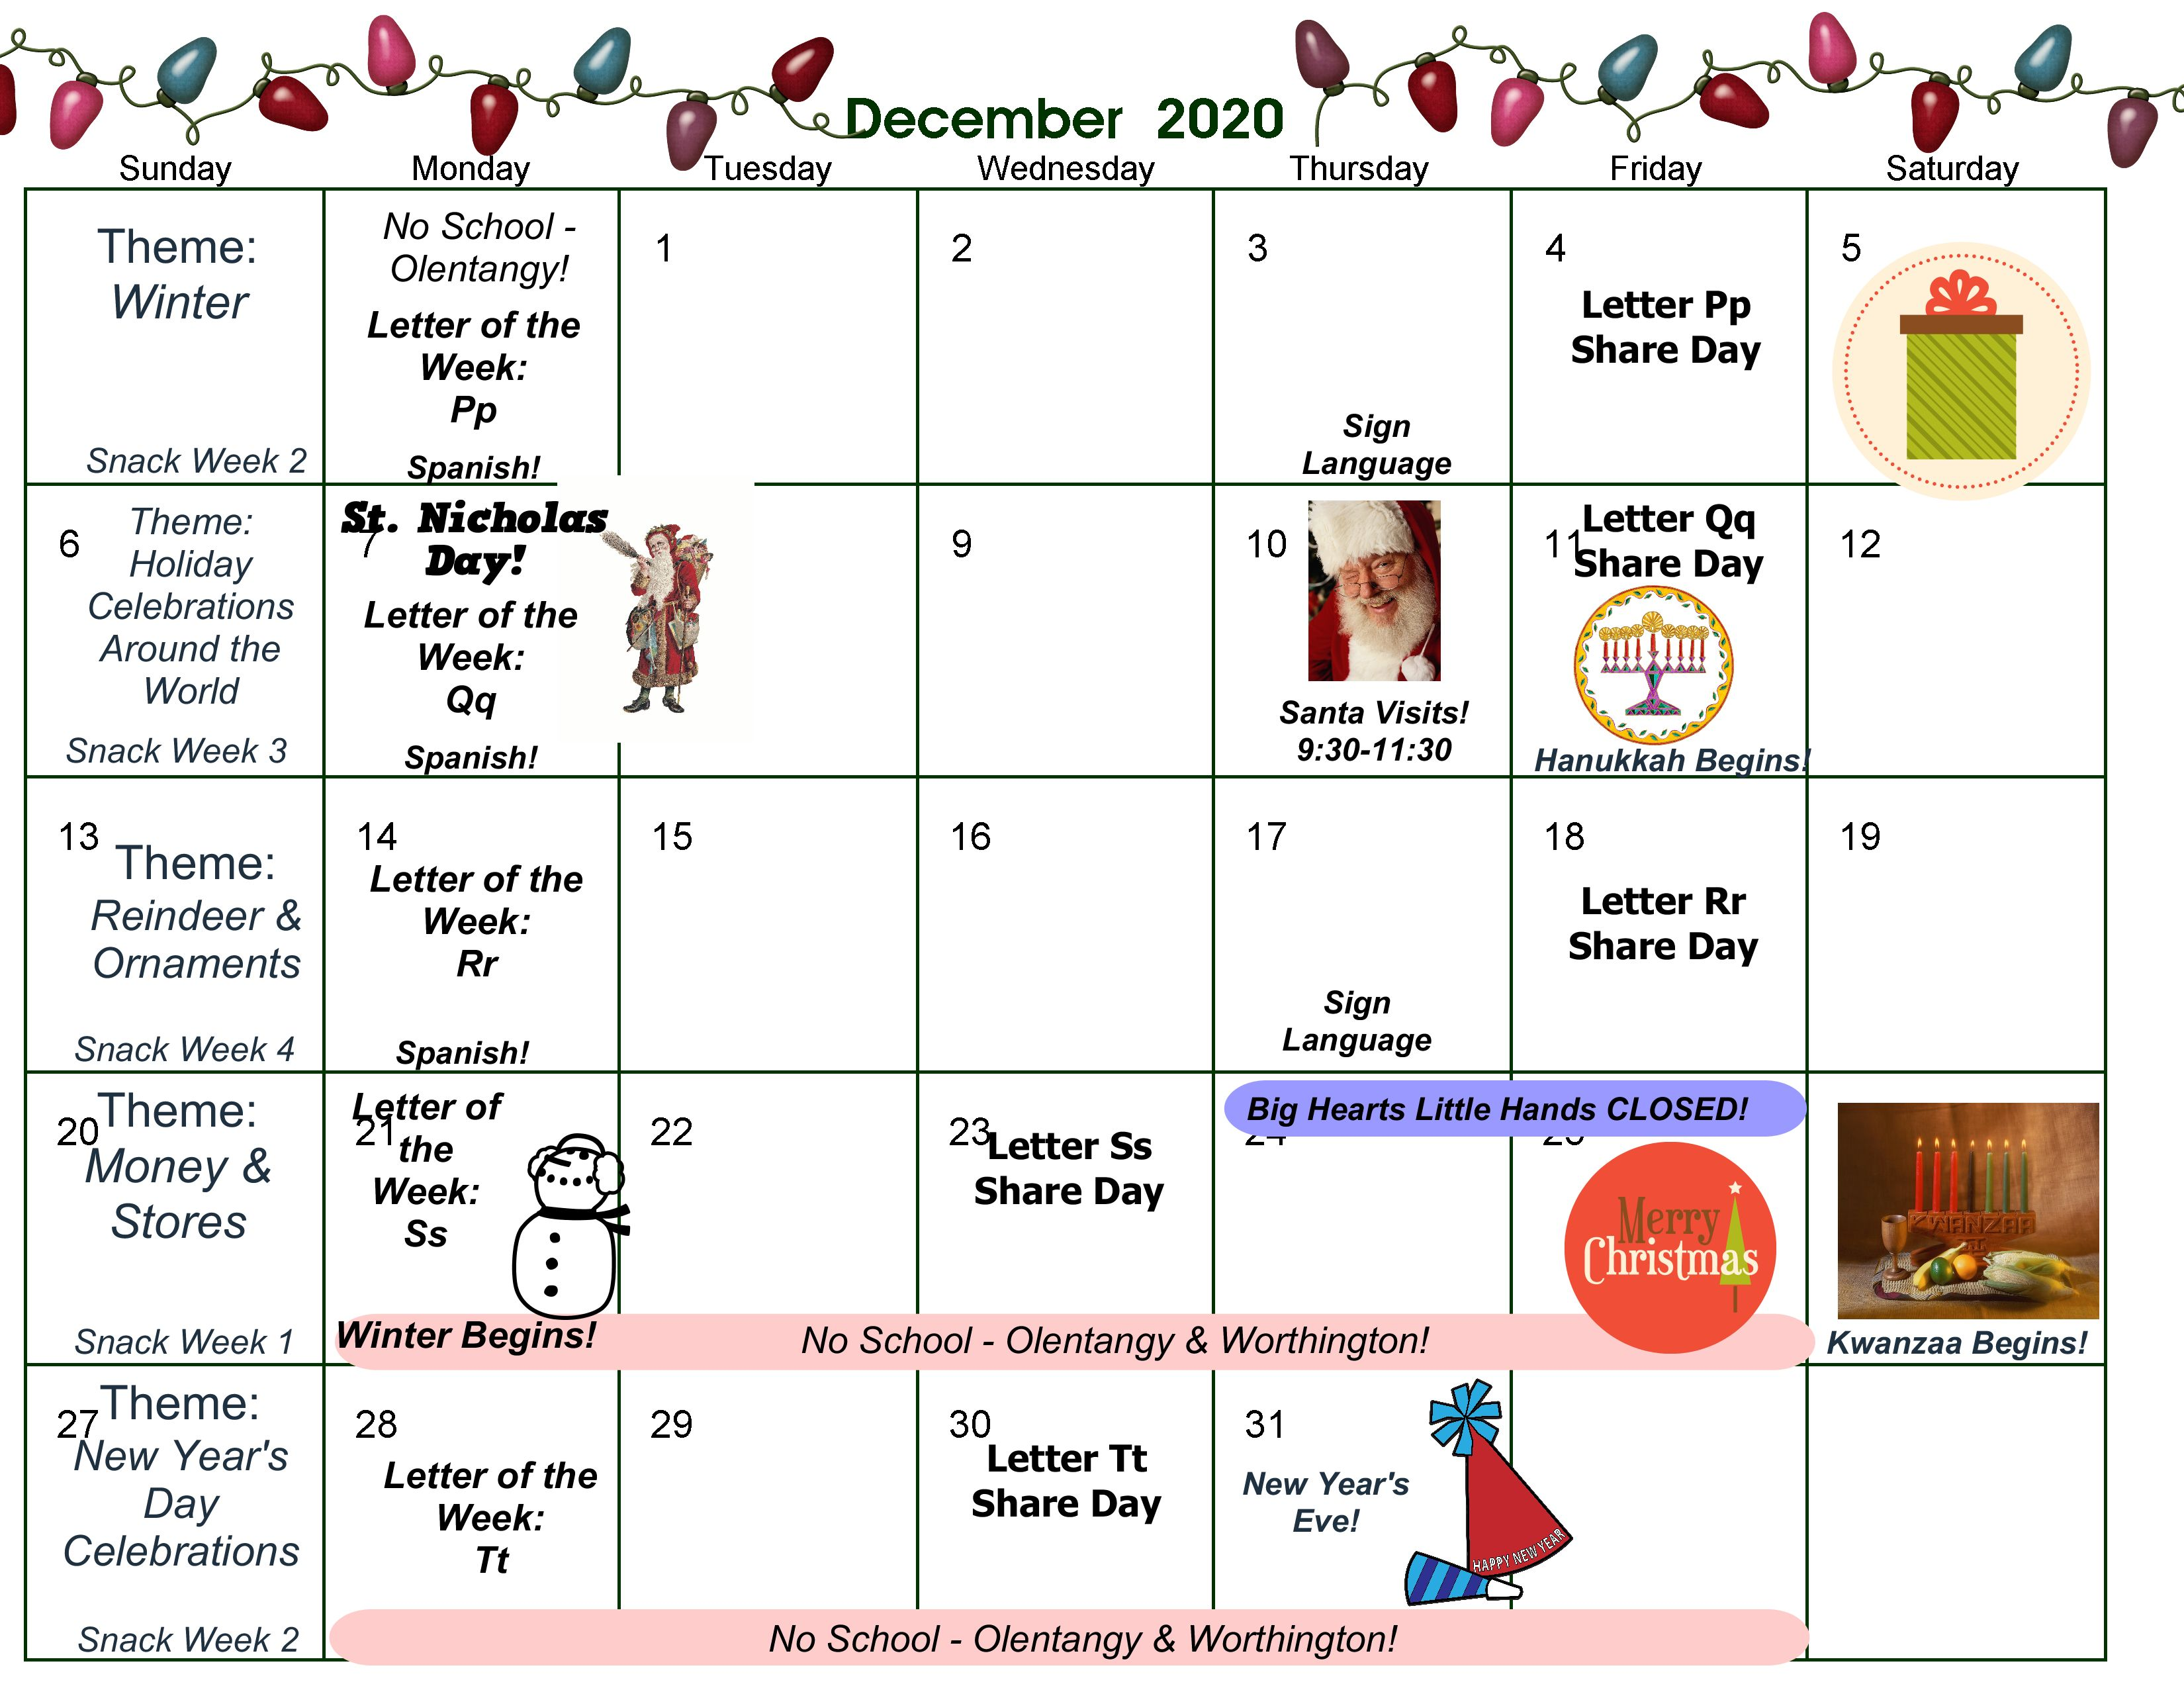 2020-12 BH December Calendar-001.jpg